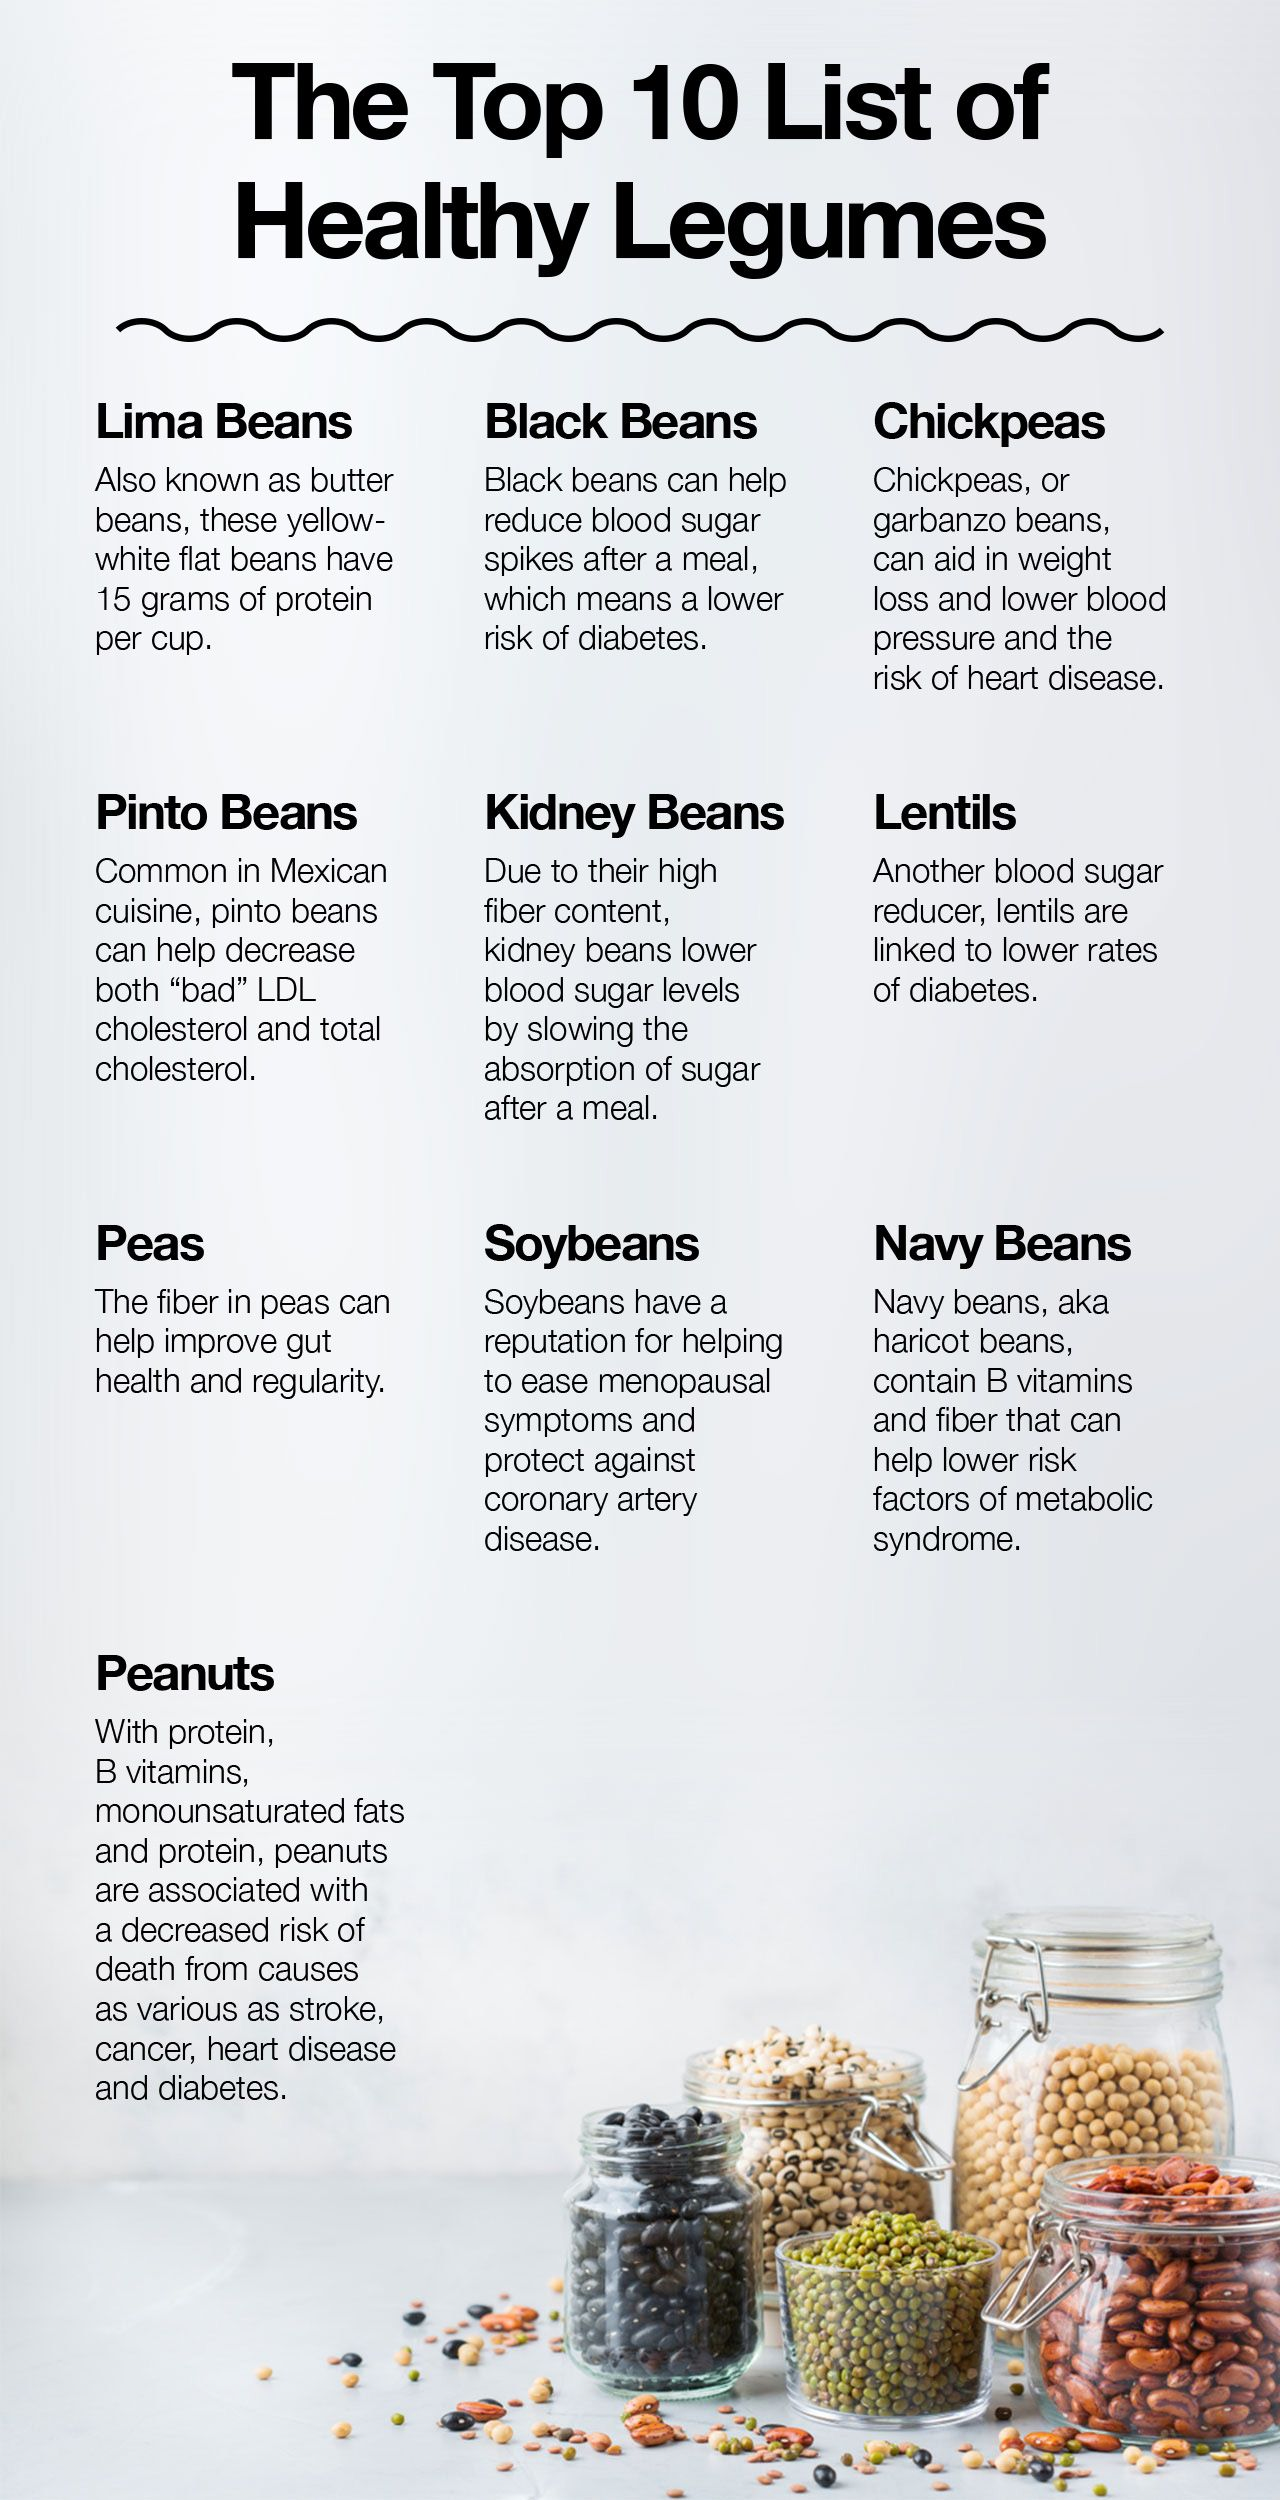 What Are Legumes The Top 10 Legumes List Veggieshake Legumes List Nutrition Recipes Healthy